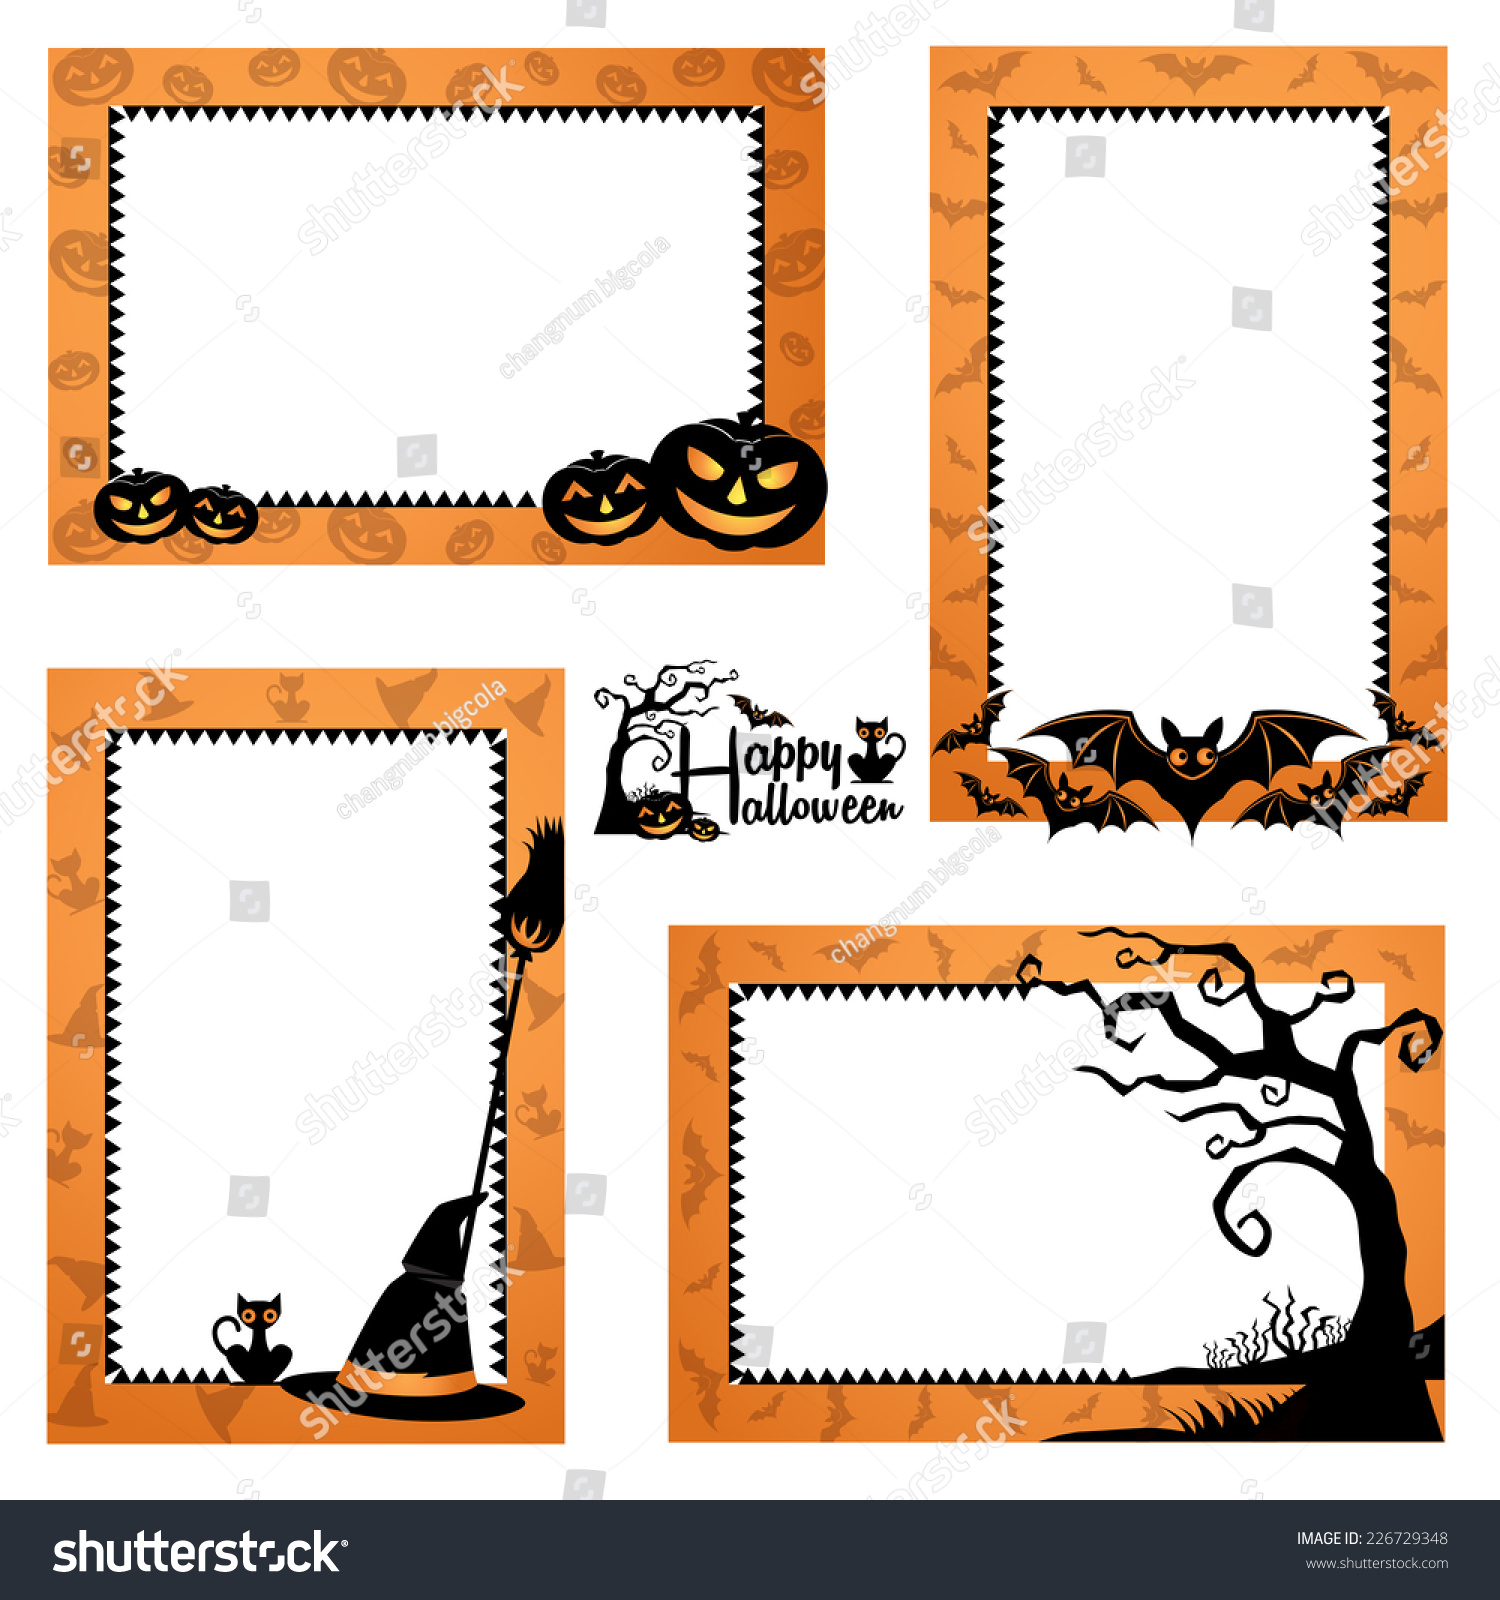 Halloween Border Design Halloween Frames Design Stock ... | 1500 x 1600 jpeg 531kB